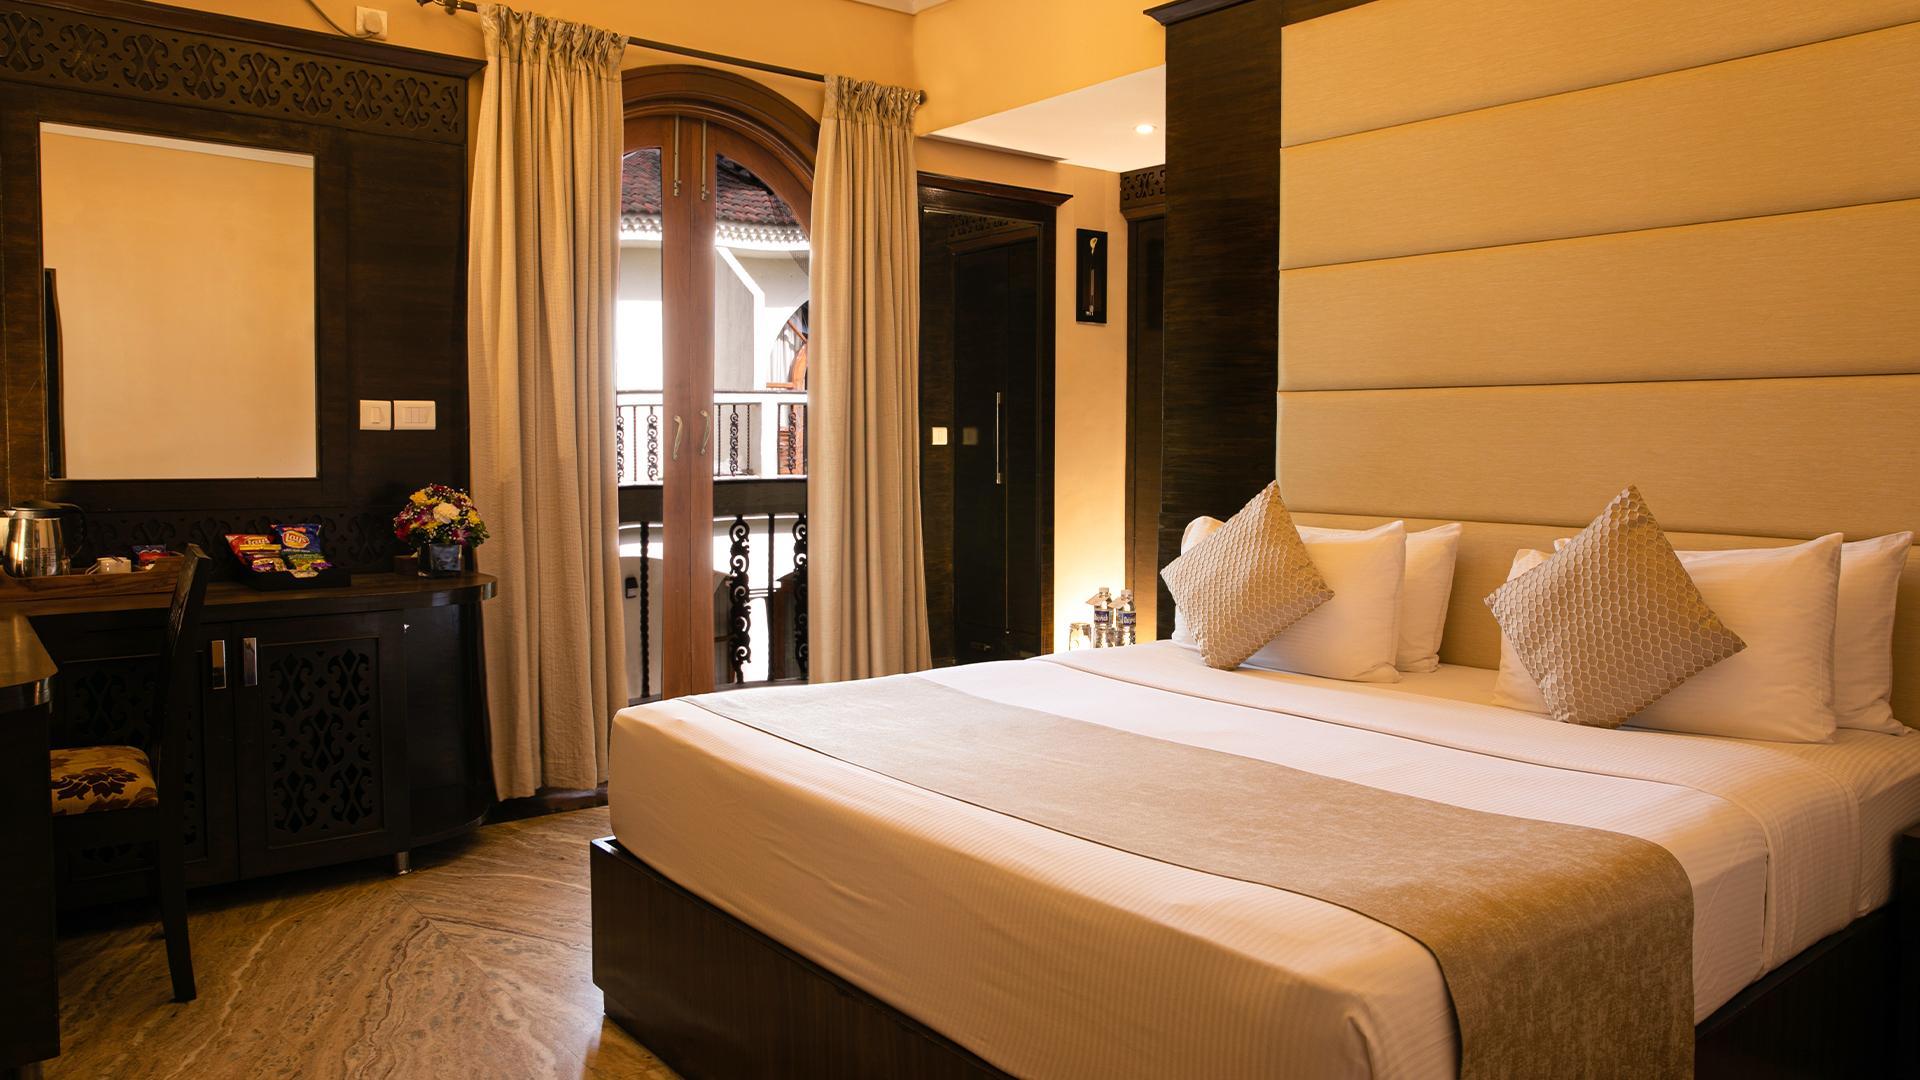 Four Bedroom Villa image 1 at Resort Rio by North Goa, Goa, India